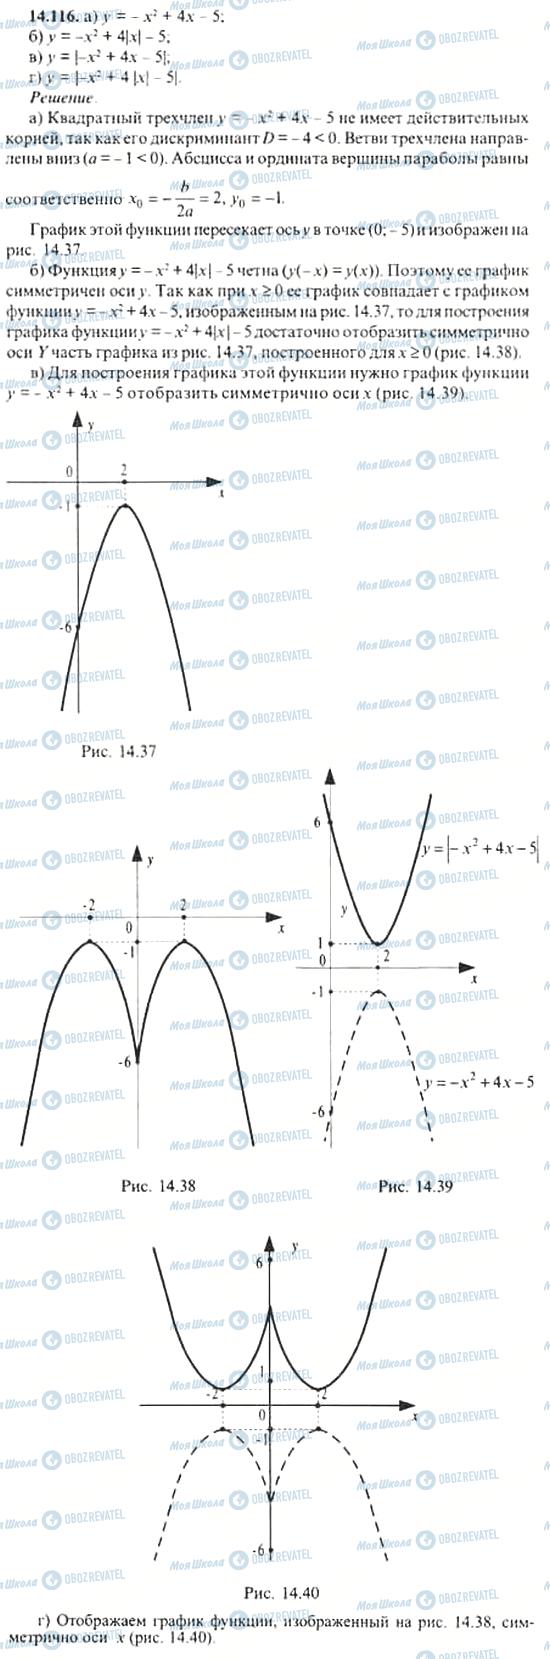 ГДЗ Алгебра 11 клас сторінка 14.116